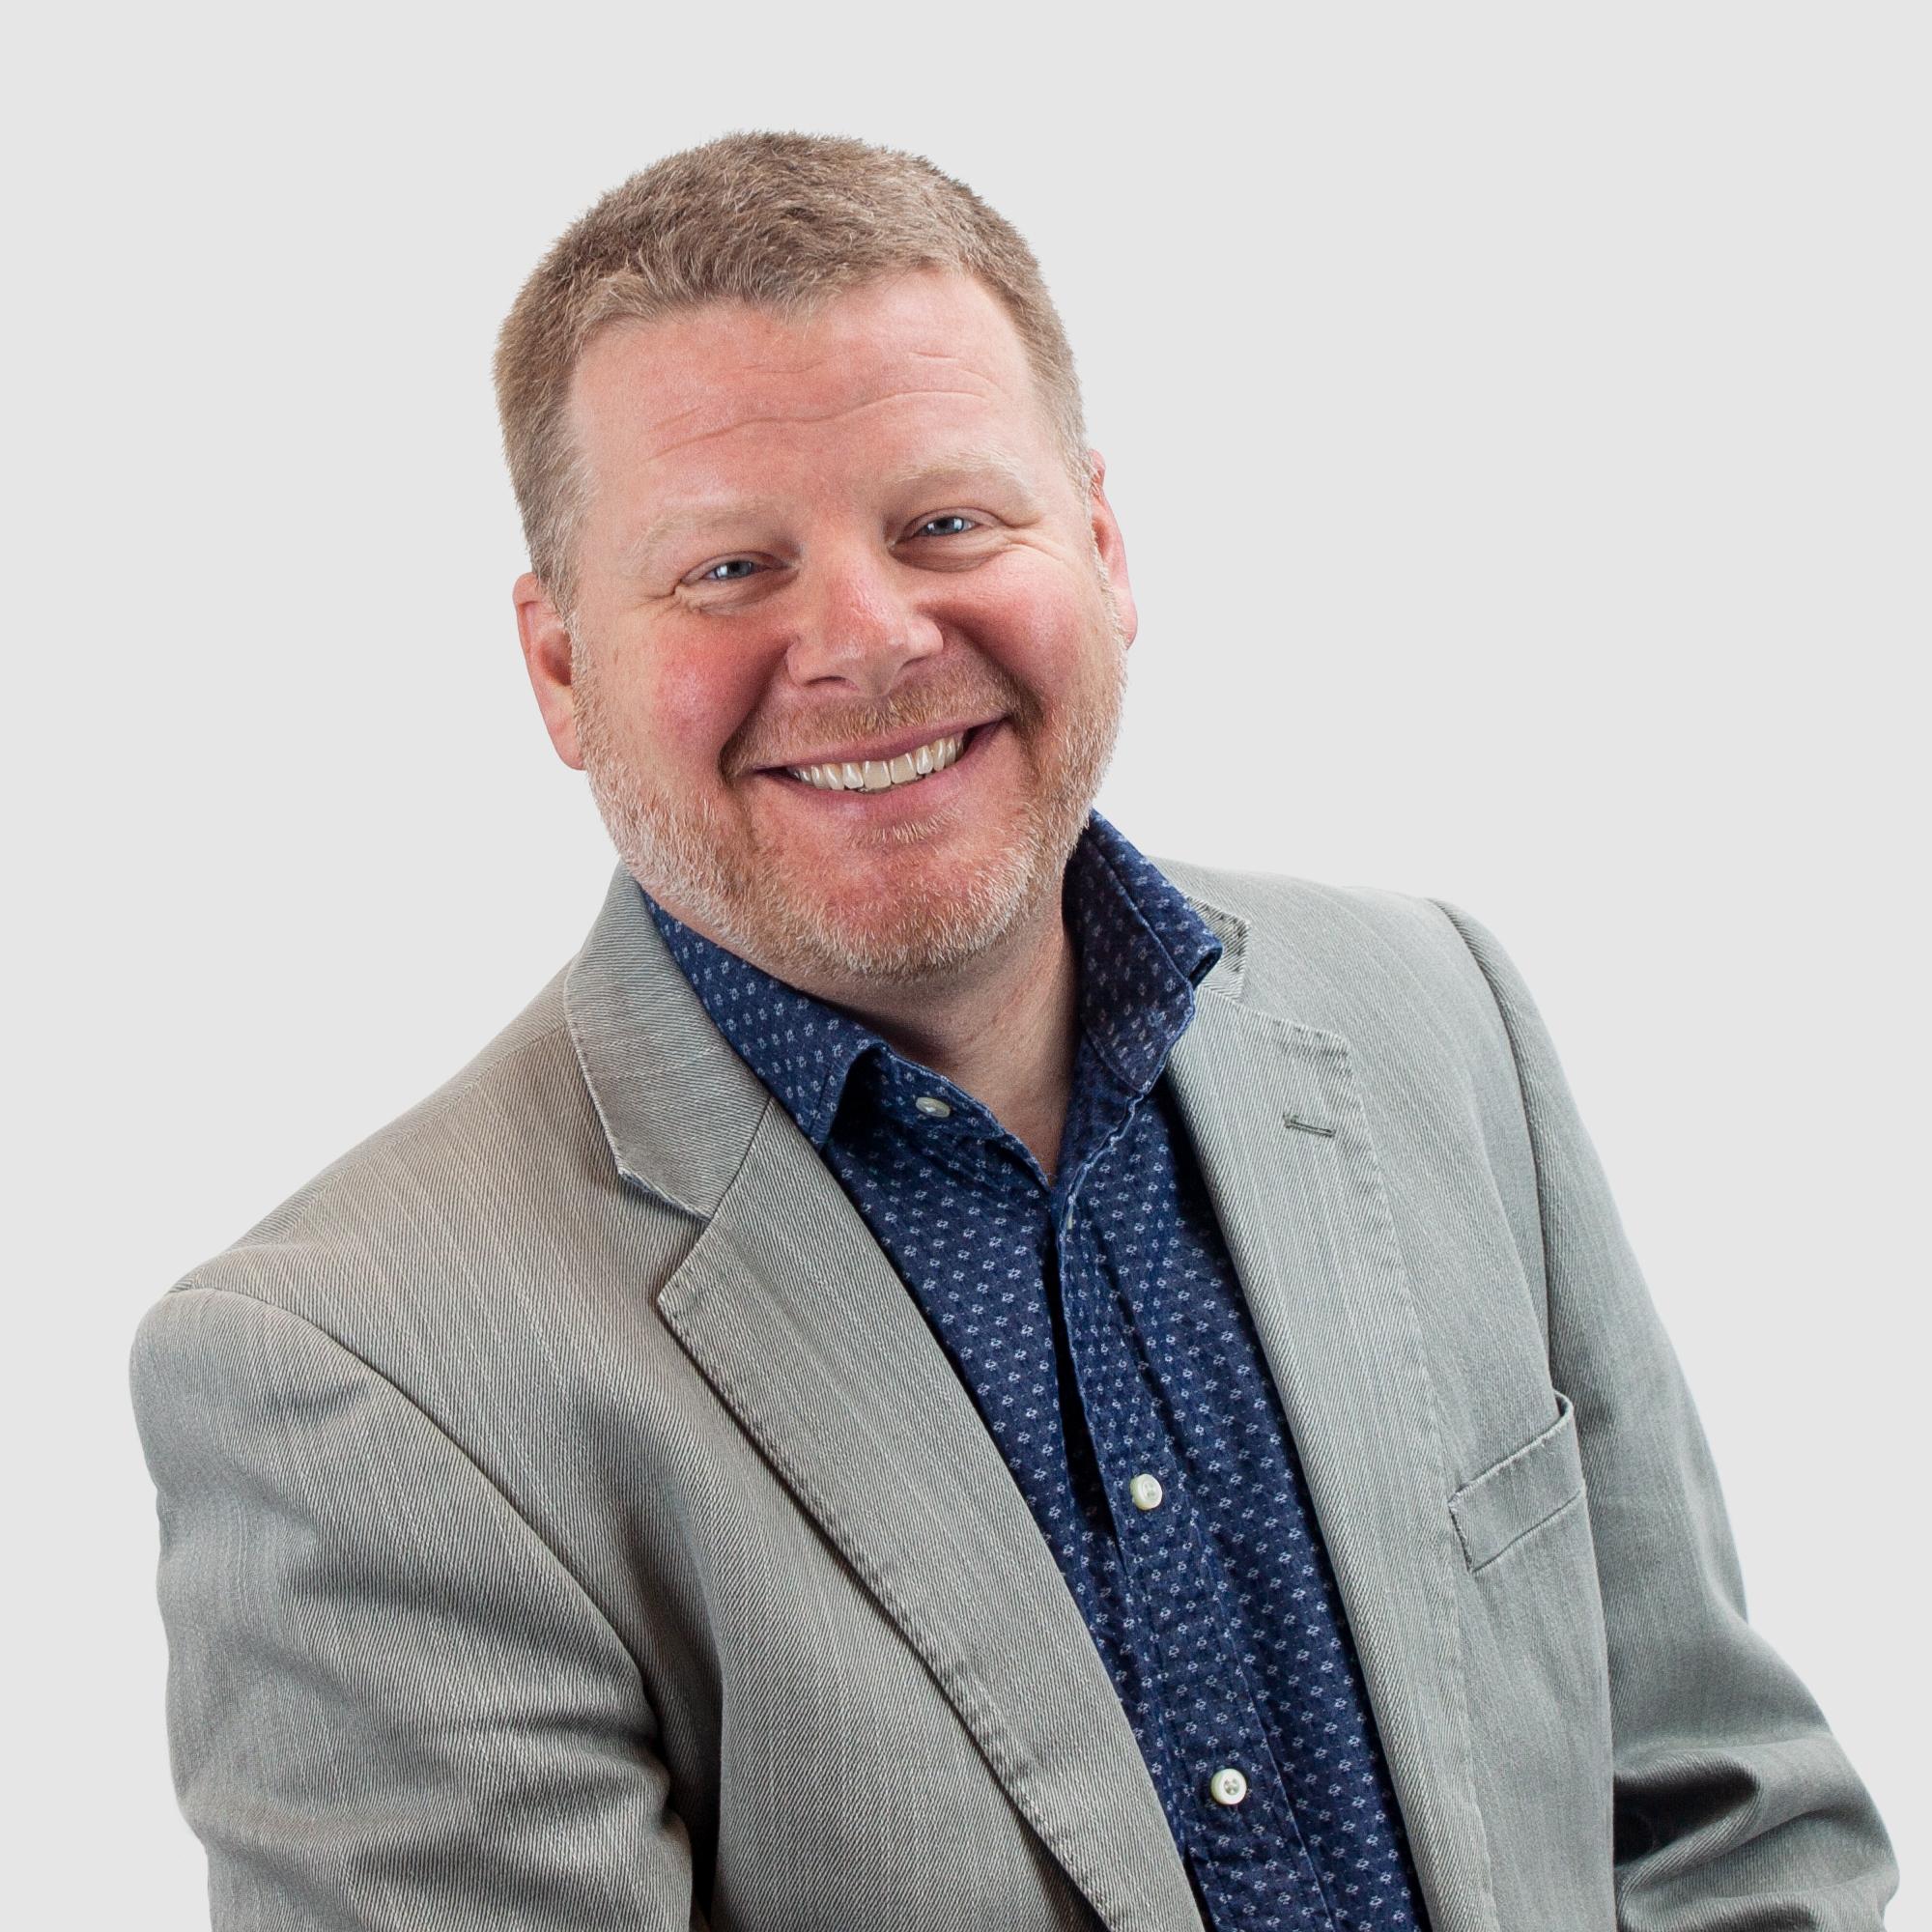 Jeff Randolph, EAG Advertising & Marketing, Nonprofit Connect Presenter